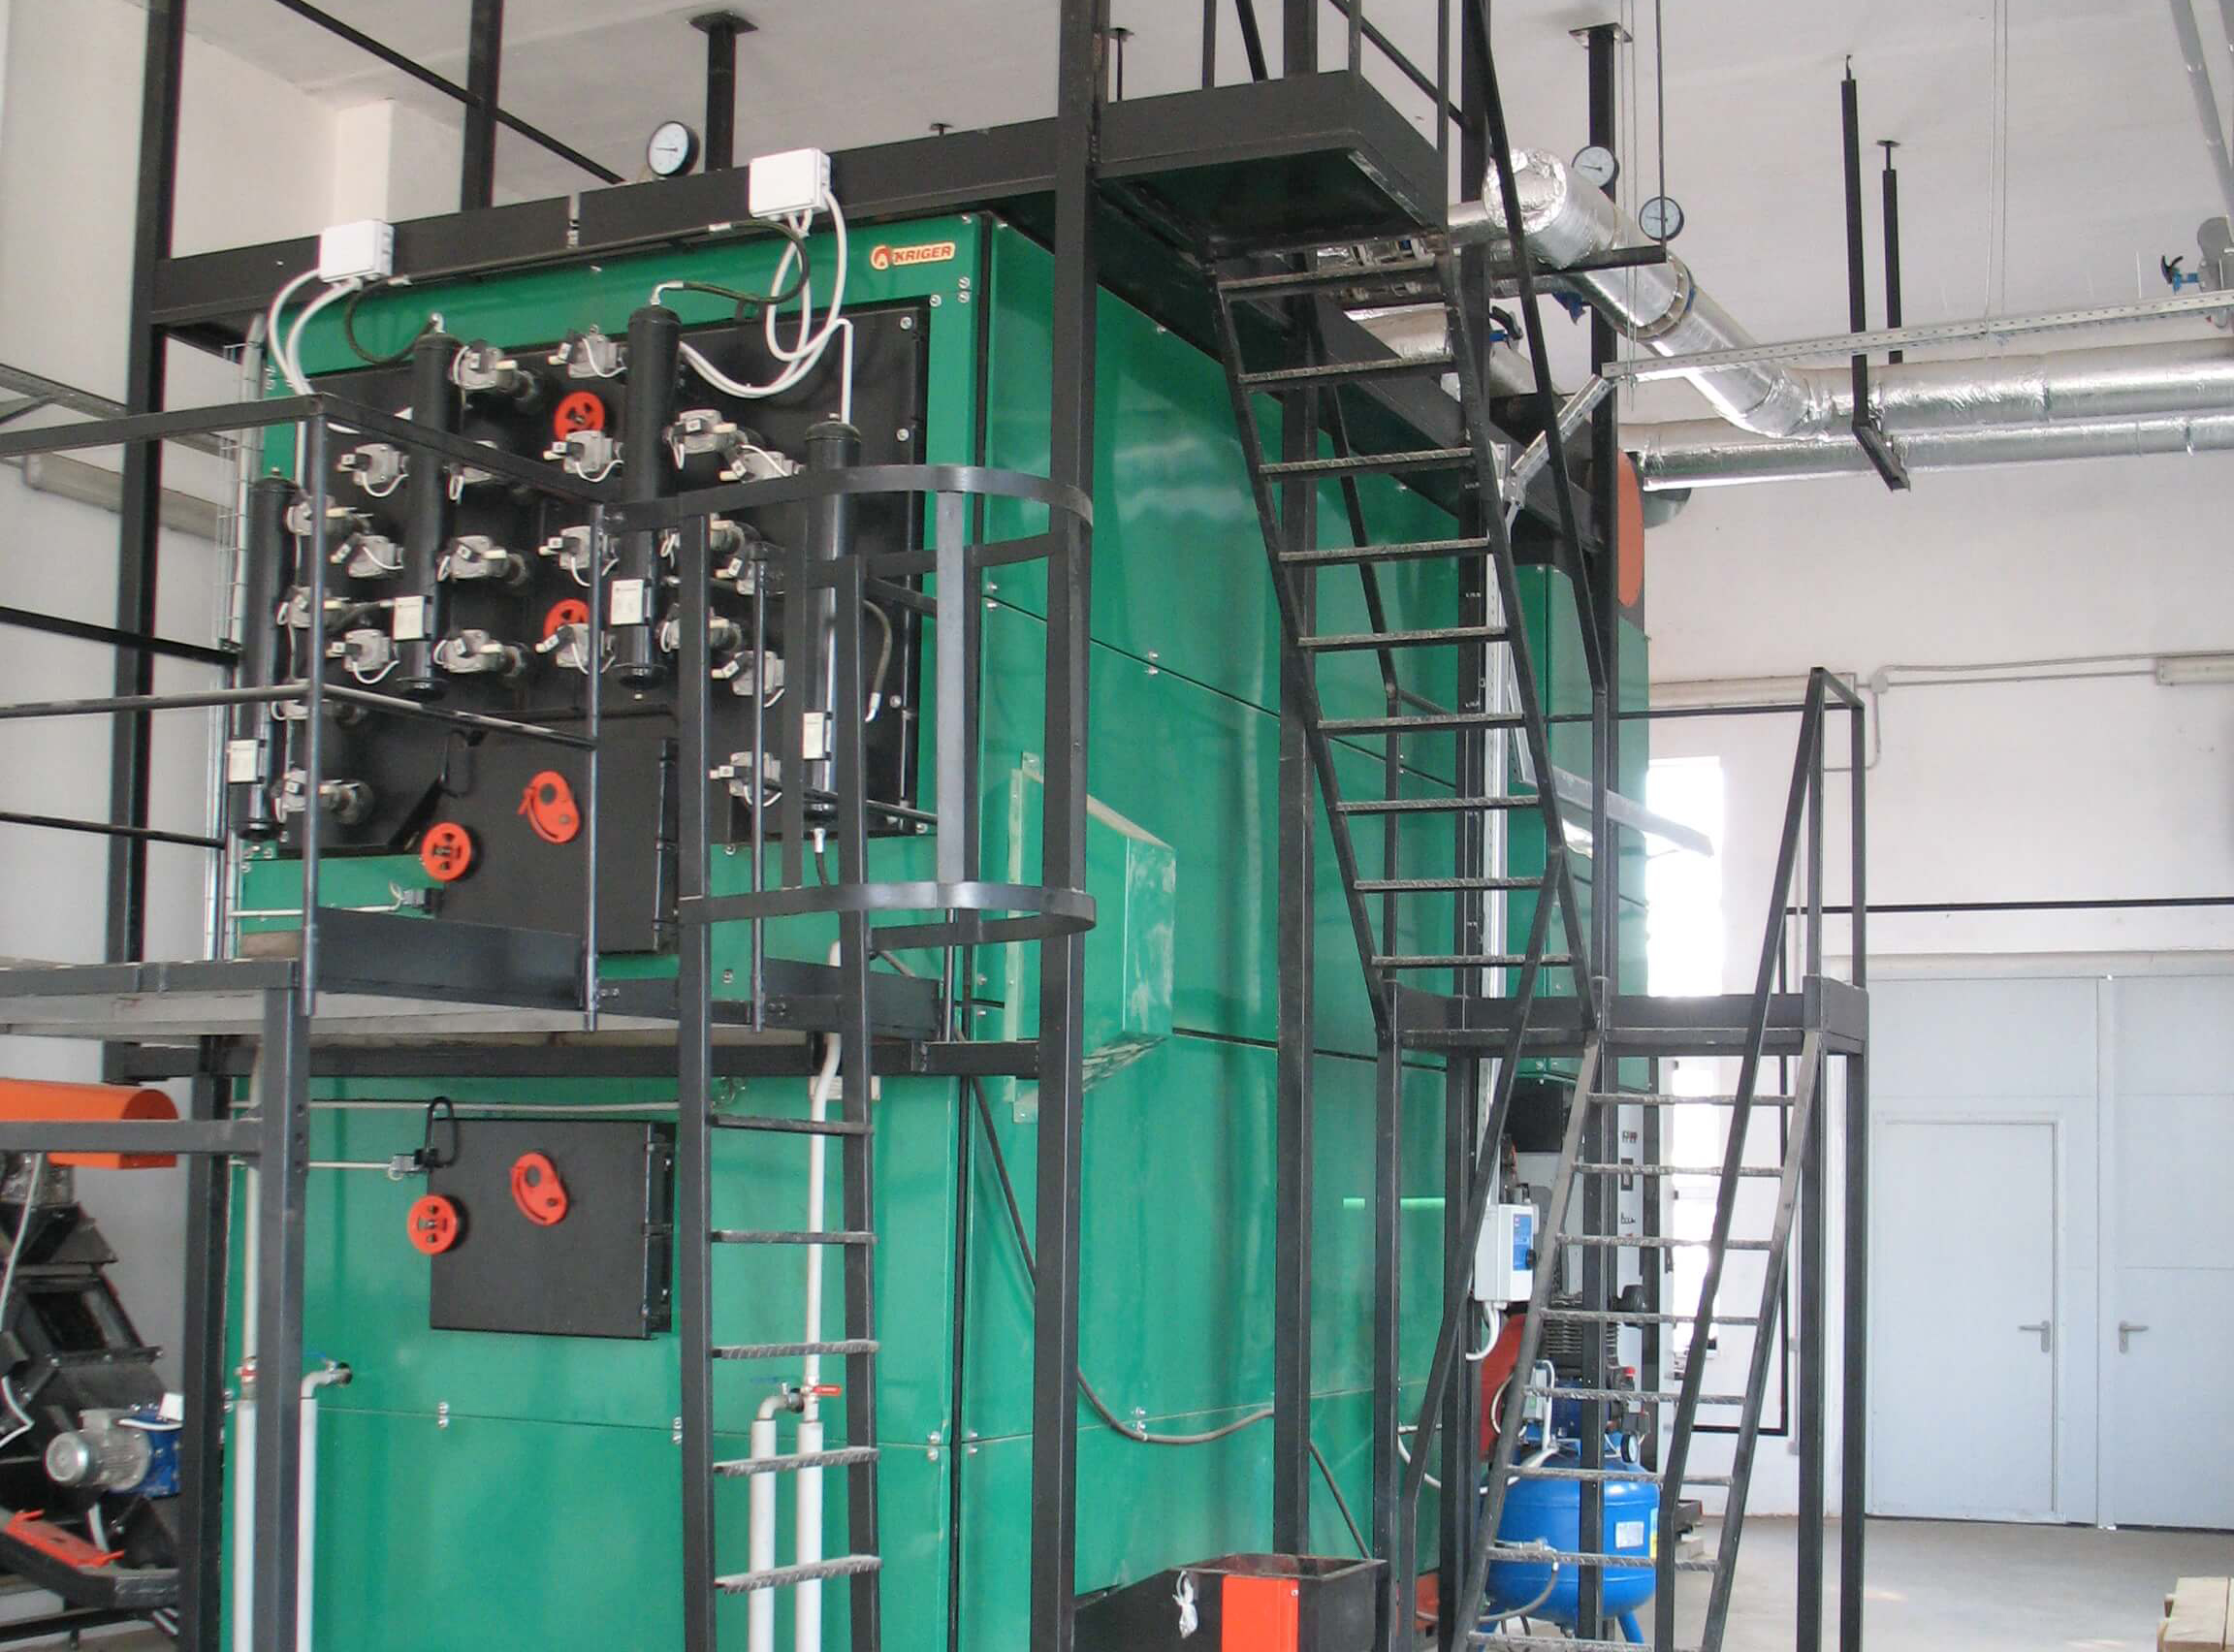 Boilerhouse with a capacity of 4.0 MW in Vinnytsia region